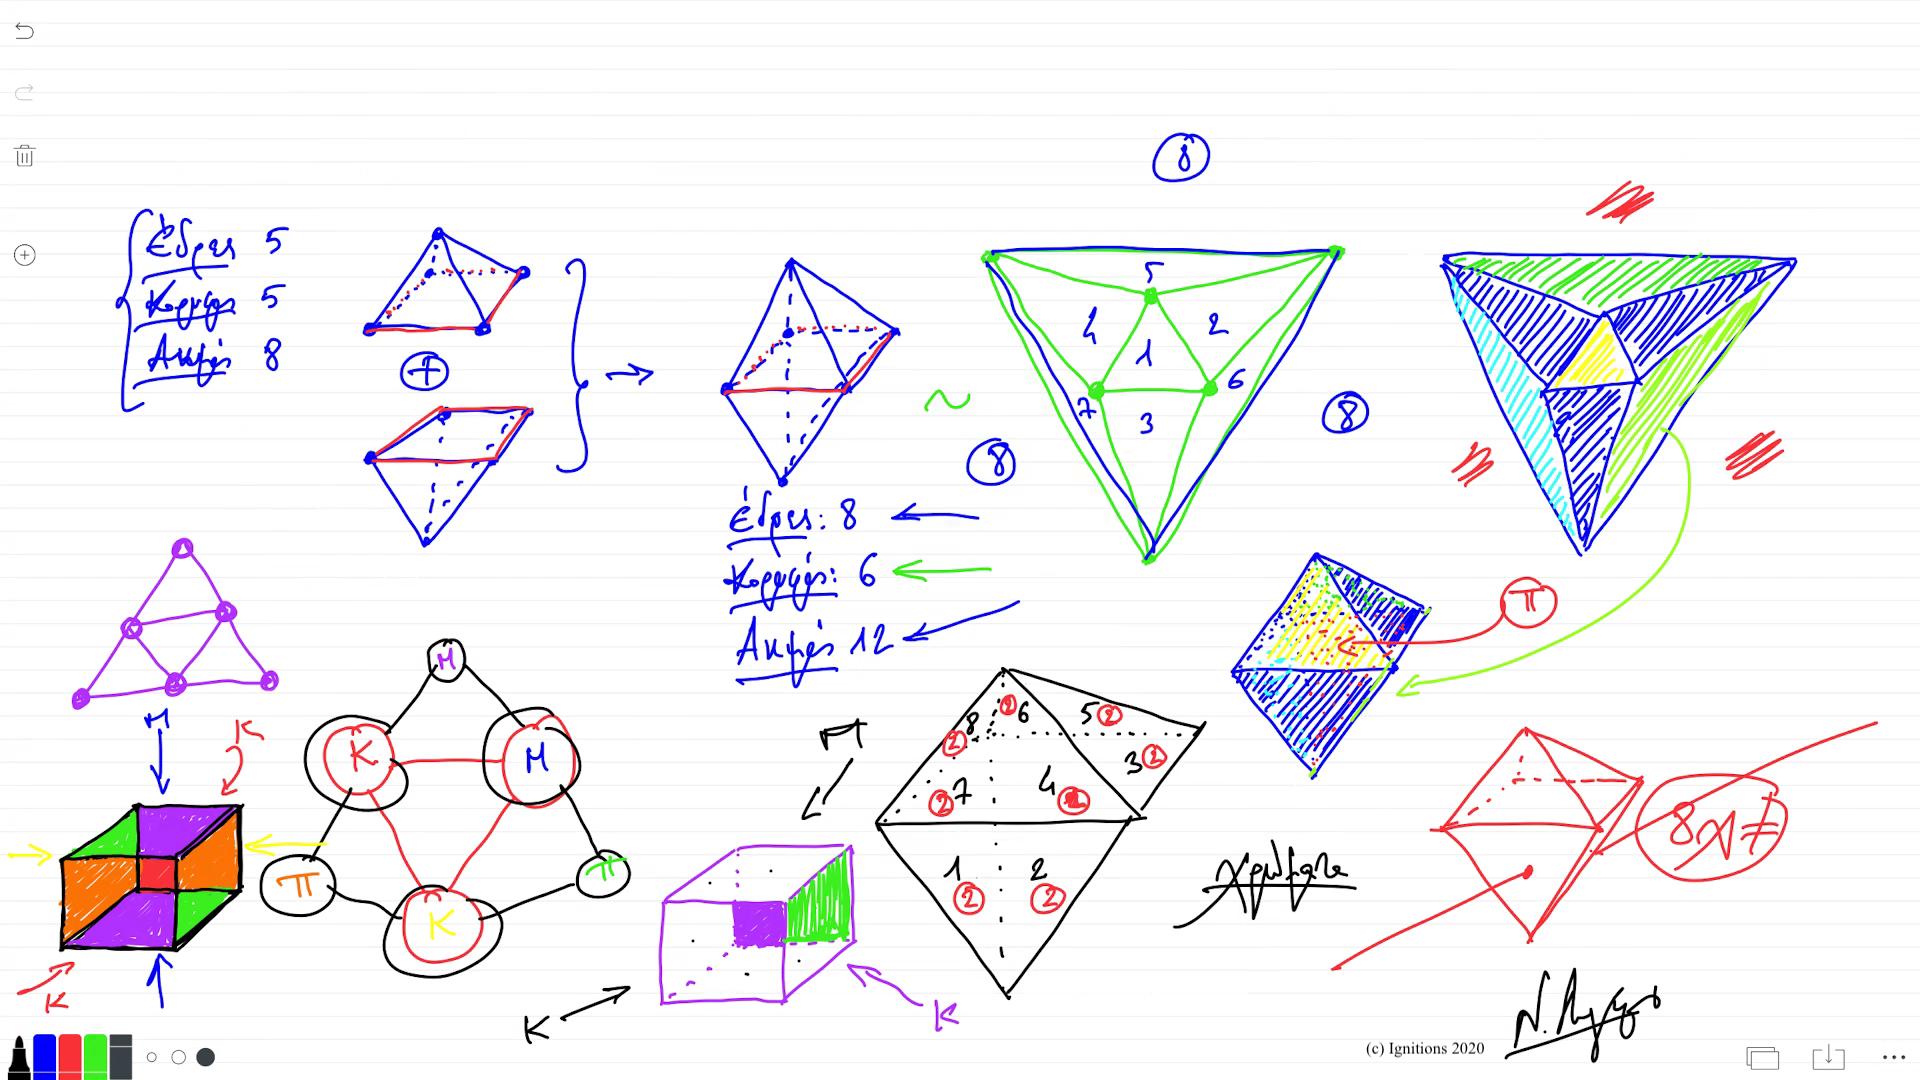 56417 - e-Μάθημα:II -Θεμέλια γεωμετρικών δομών. (Dessin)